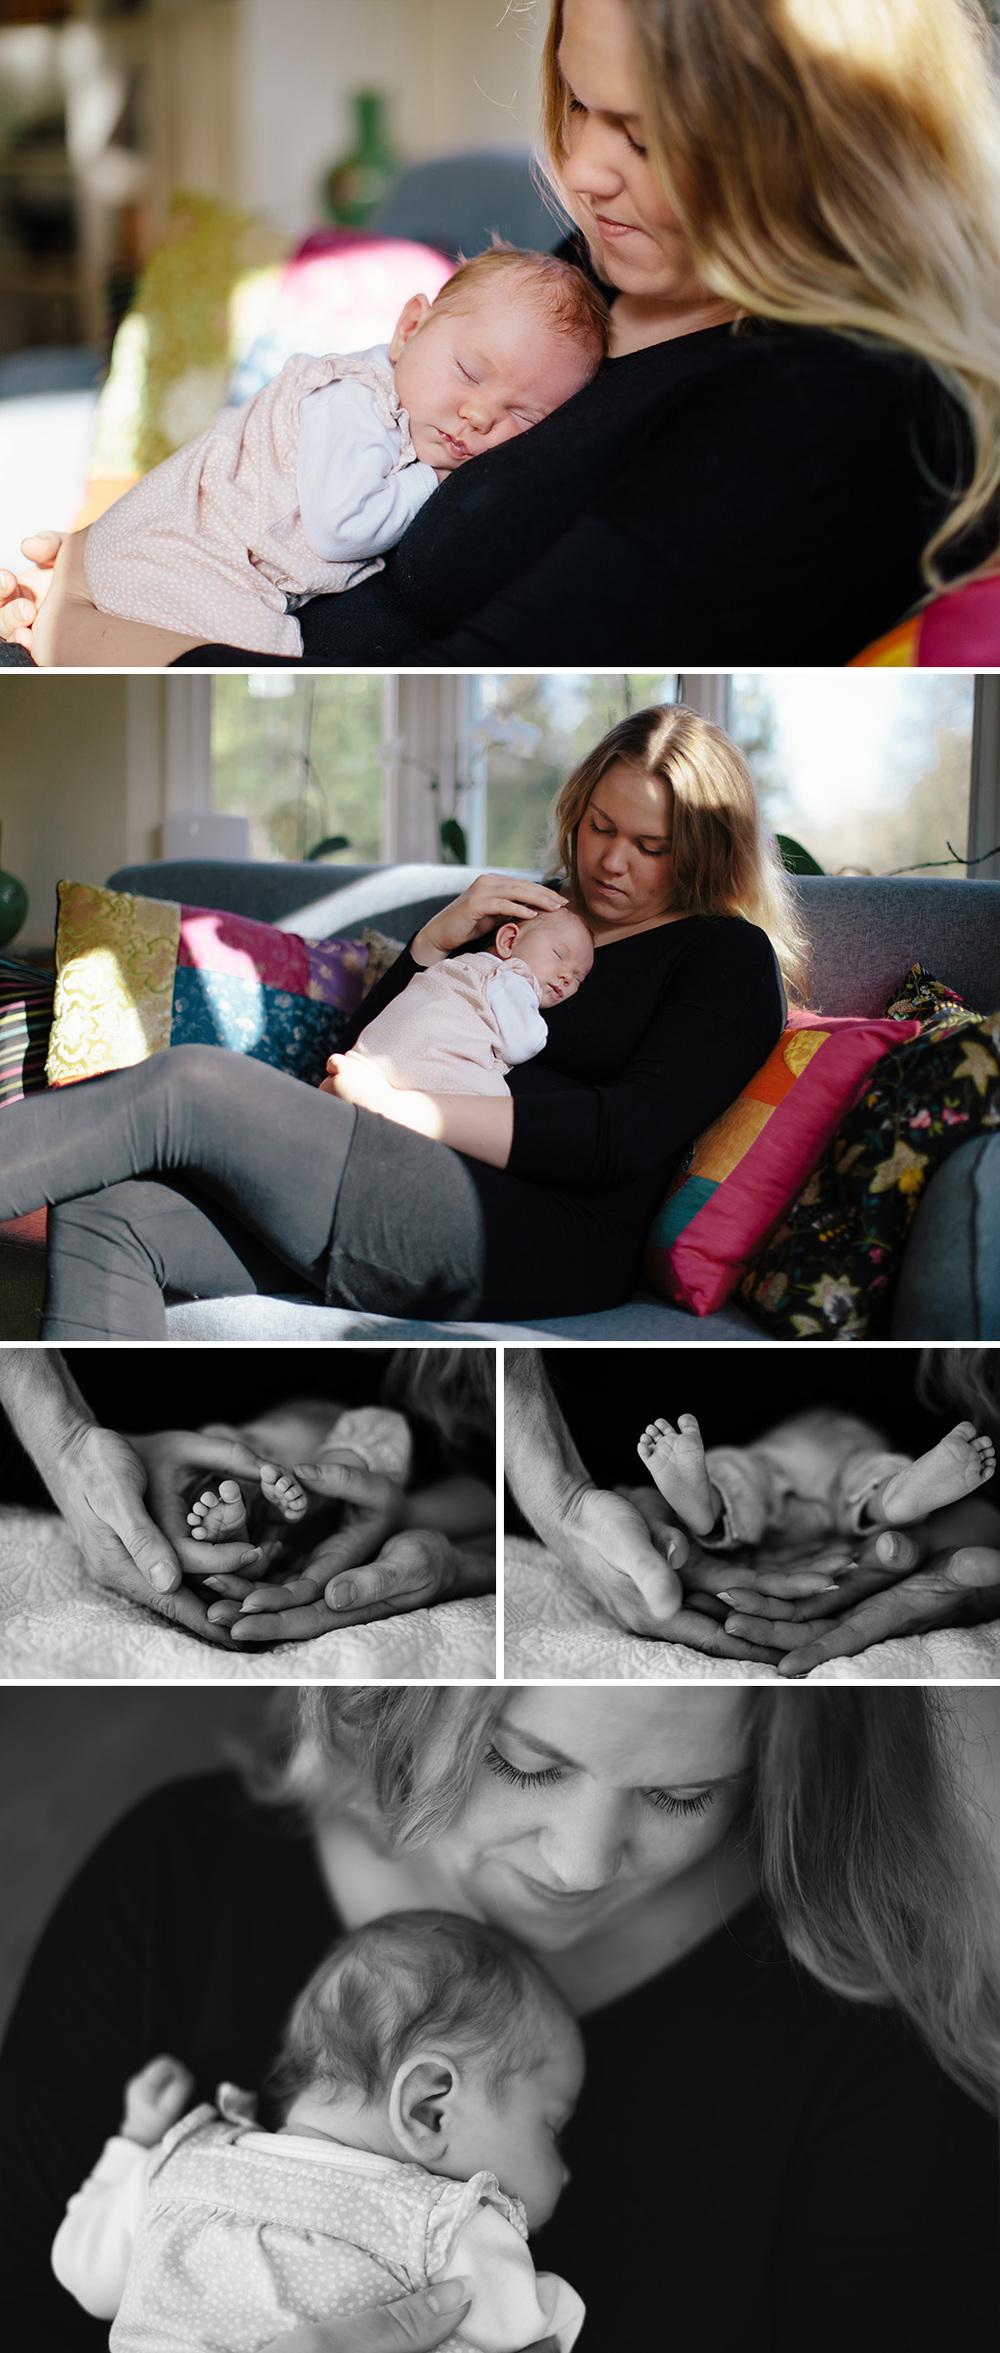 Nyfoddfotografering_newborn_familjefotograf_hemma-hosfotografering-8.jpg